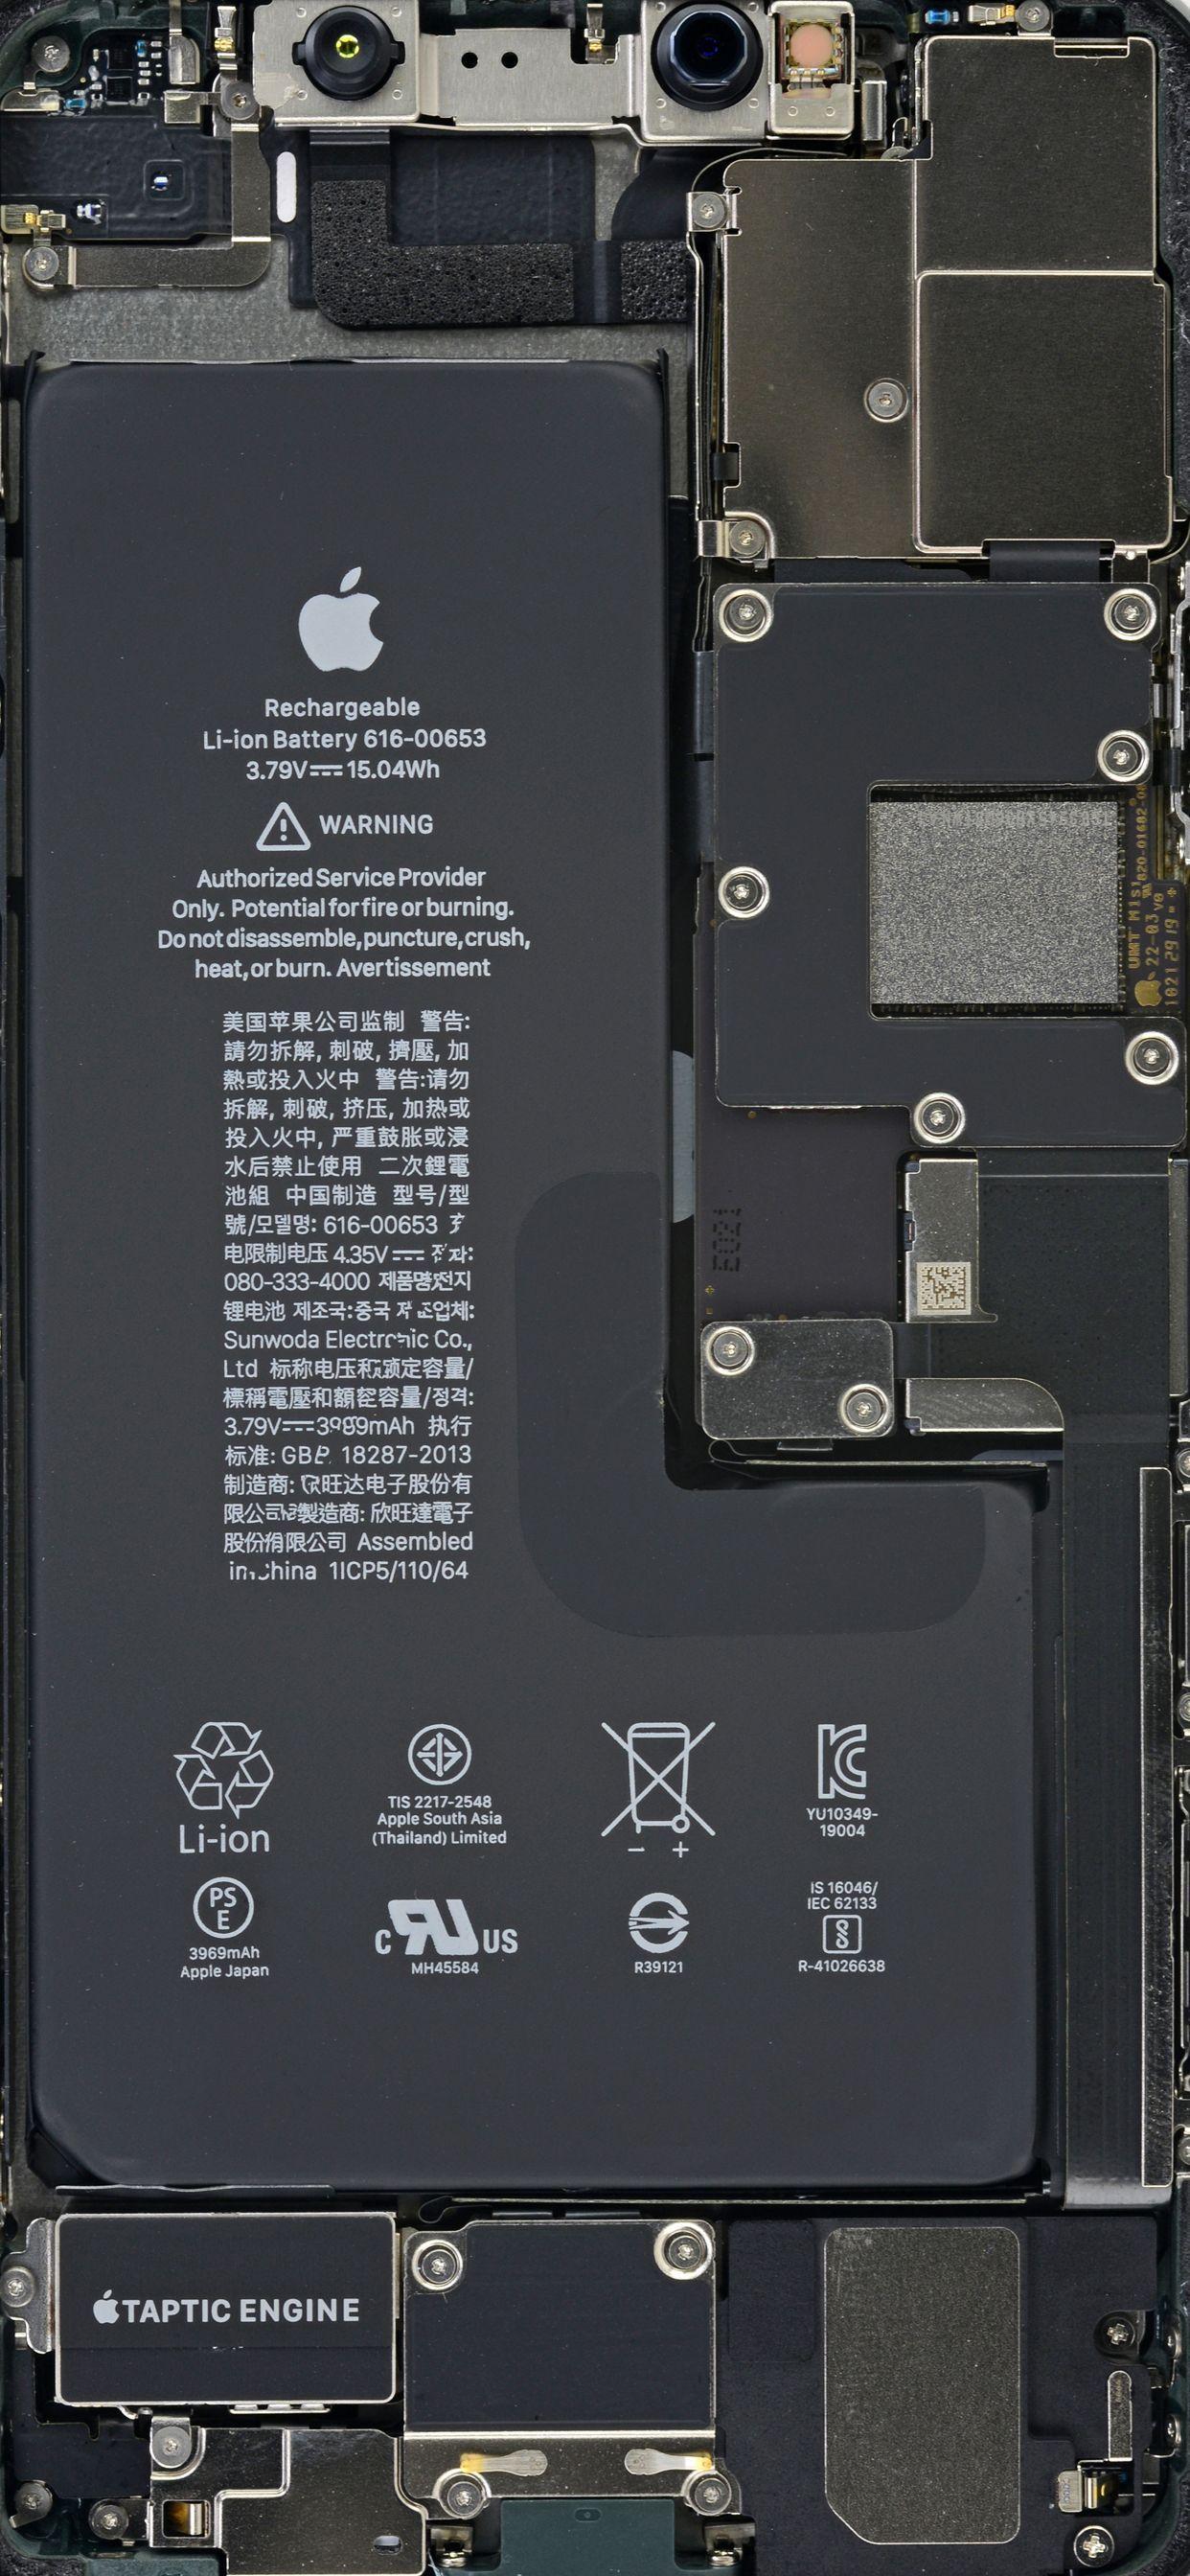 Iphone 11 Pro Max Hd Original Wallpapers Iphone 11 Pro Max Iphone 11 Iphone Wallpaper Hd Wallpaper Fur Iphone Apple Hintergrund Iphone Hintergrund Iphone